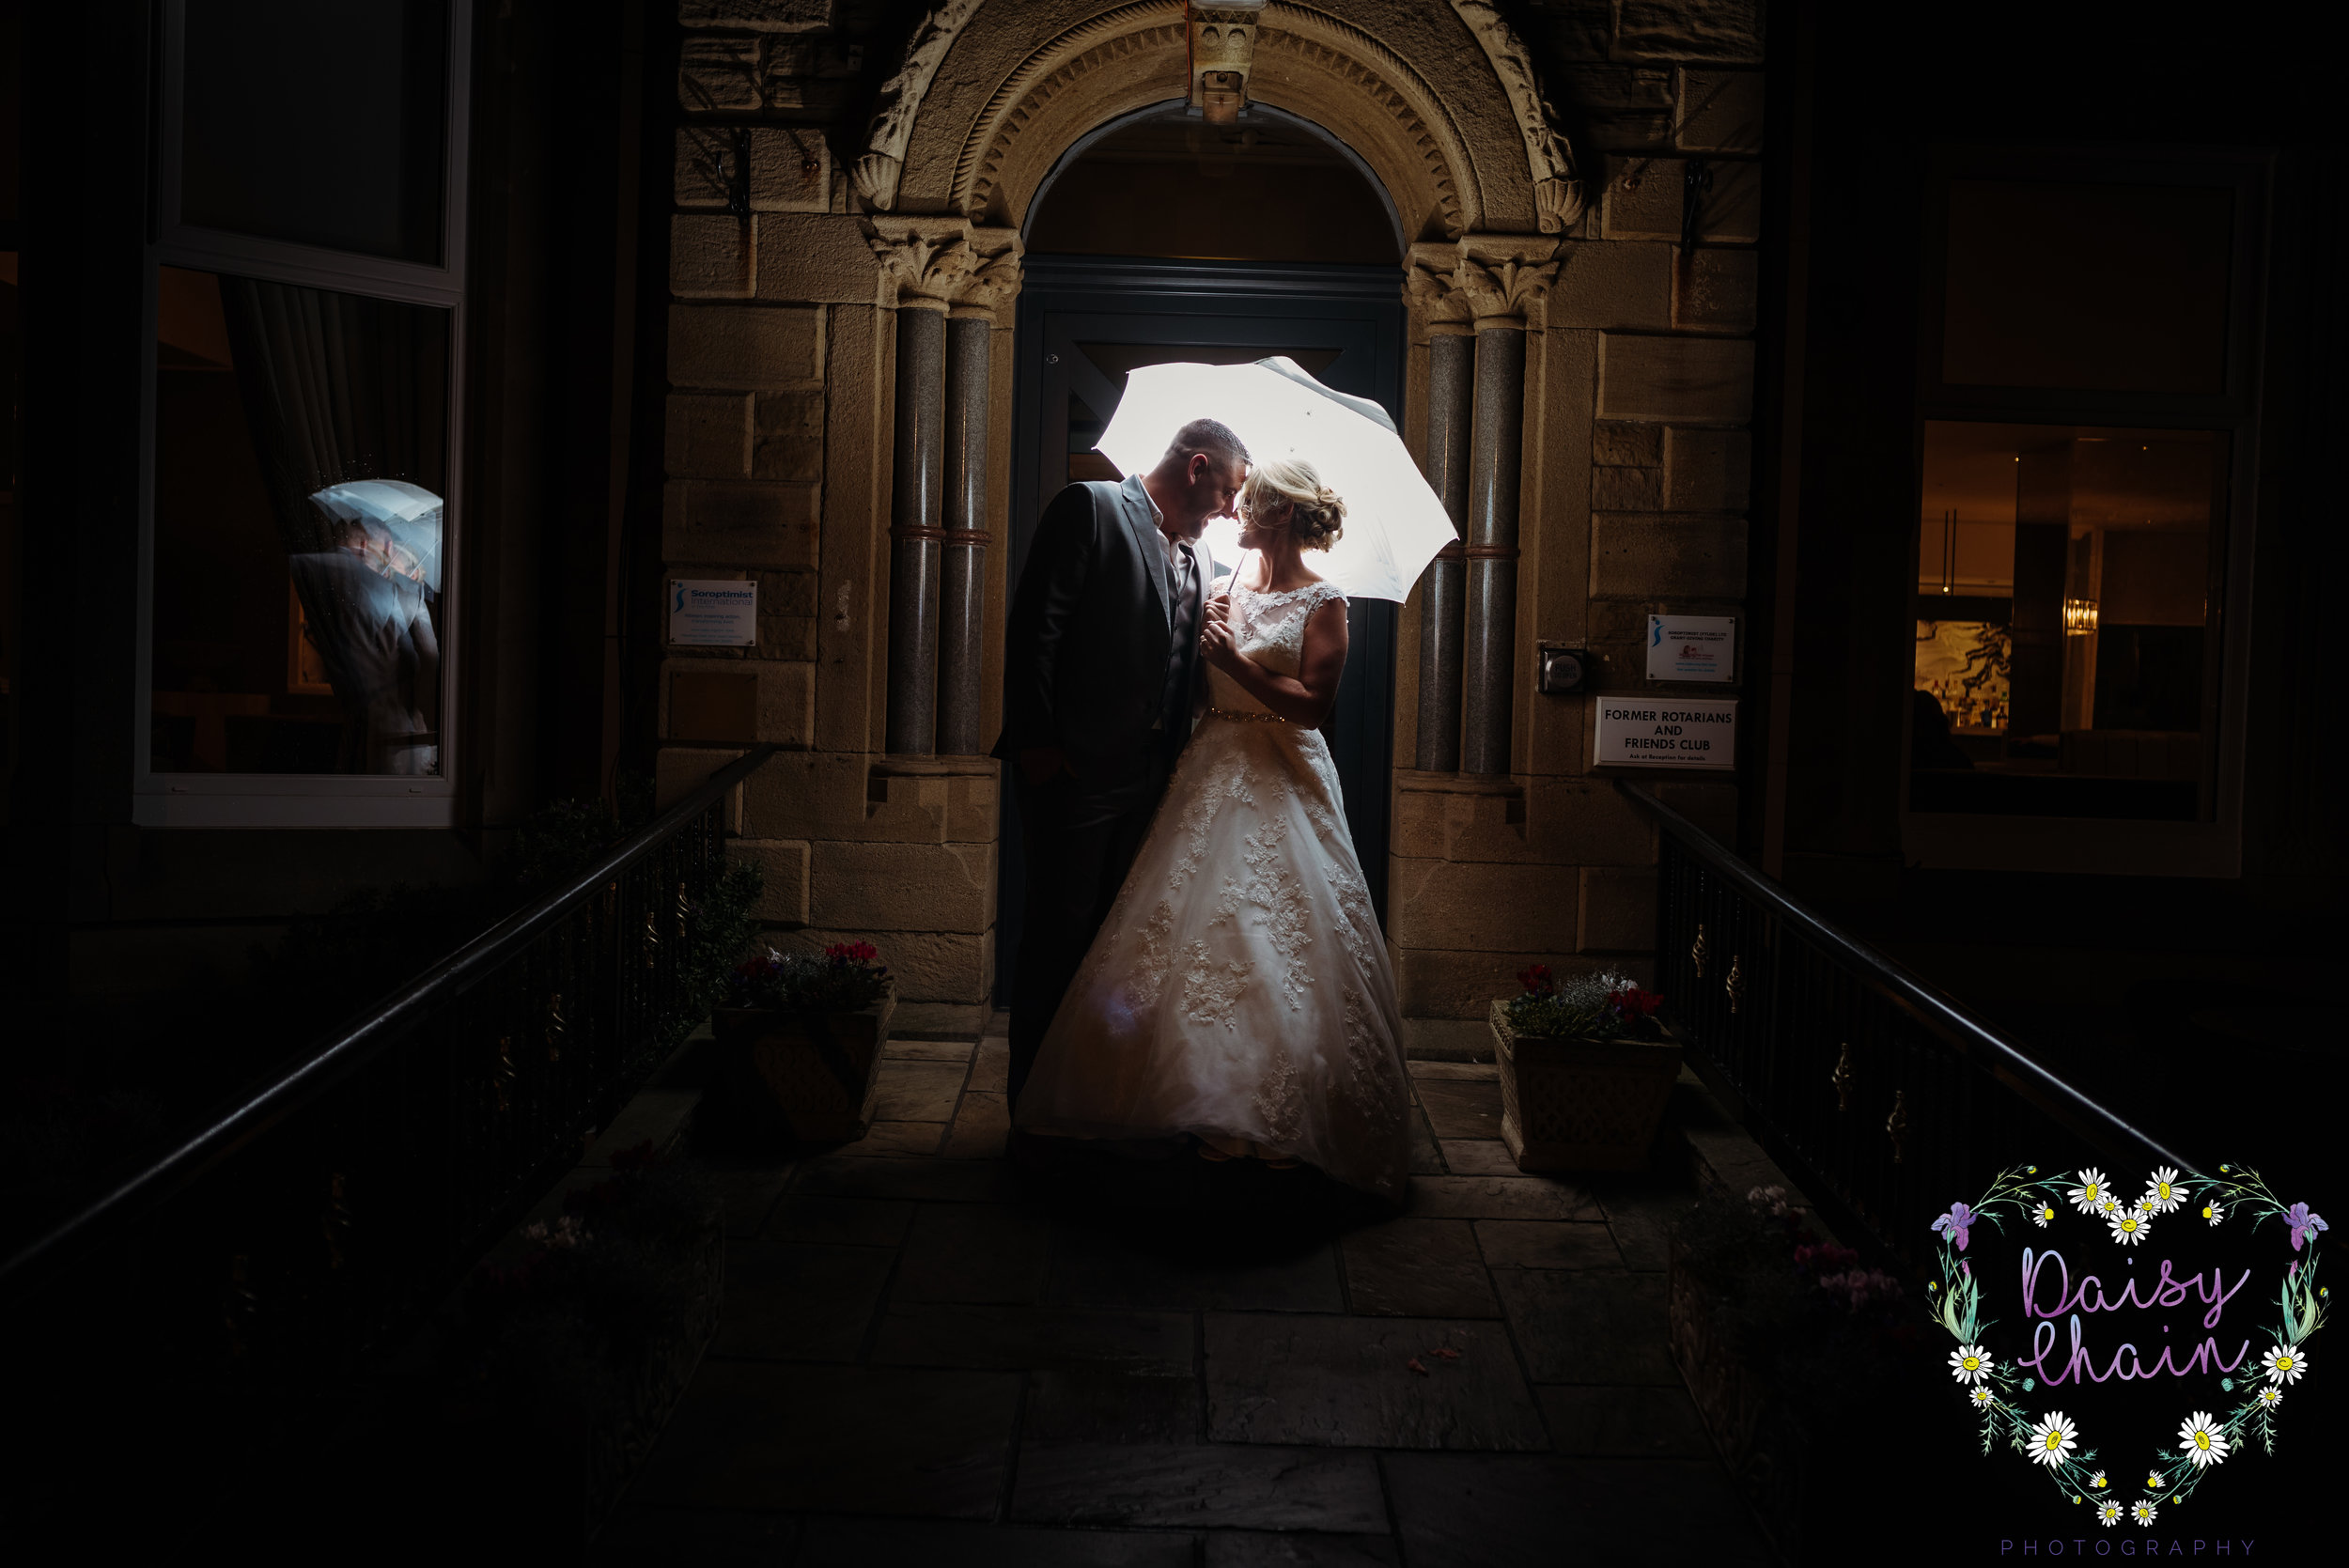 Blackpool wedding photographer